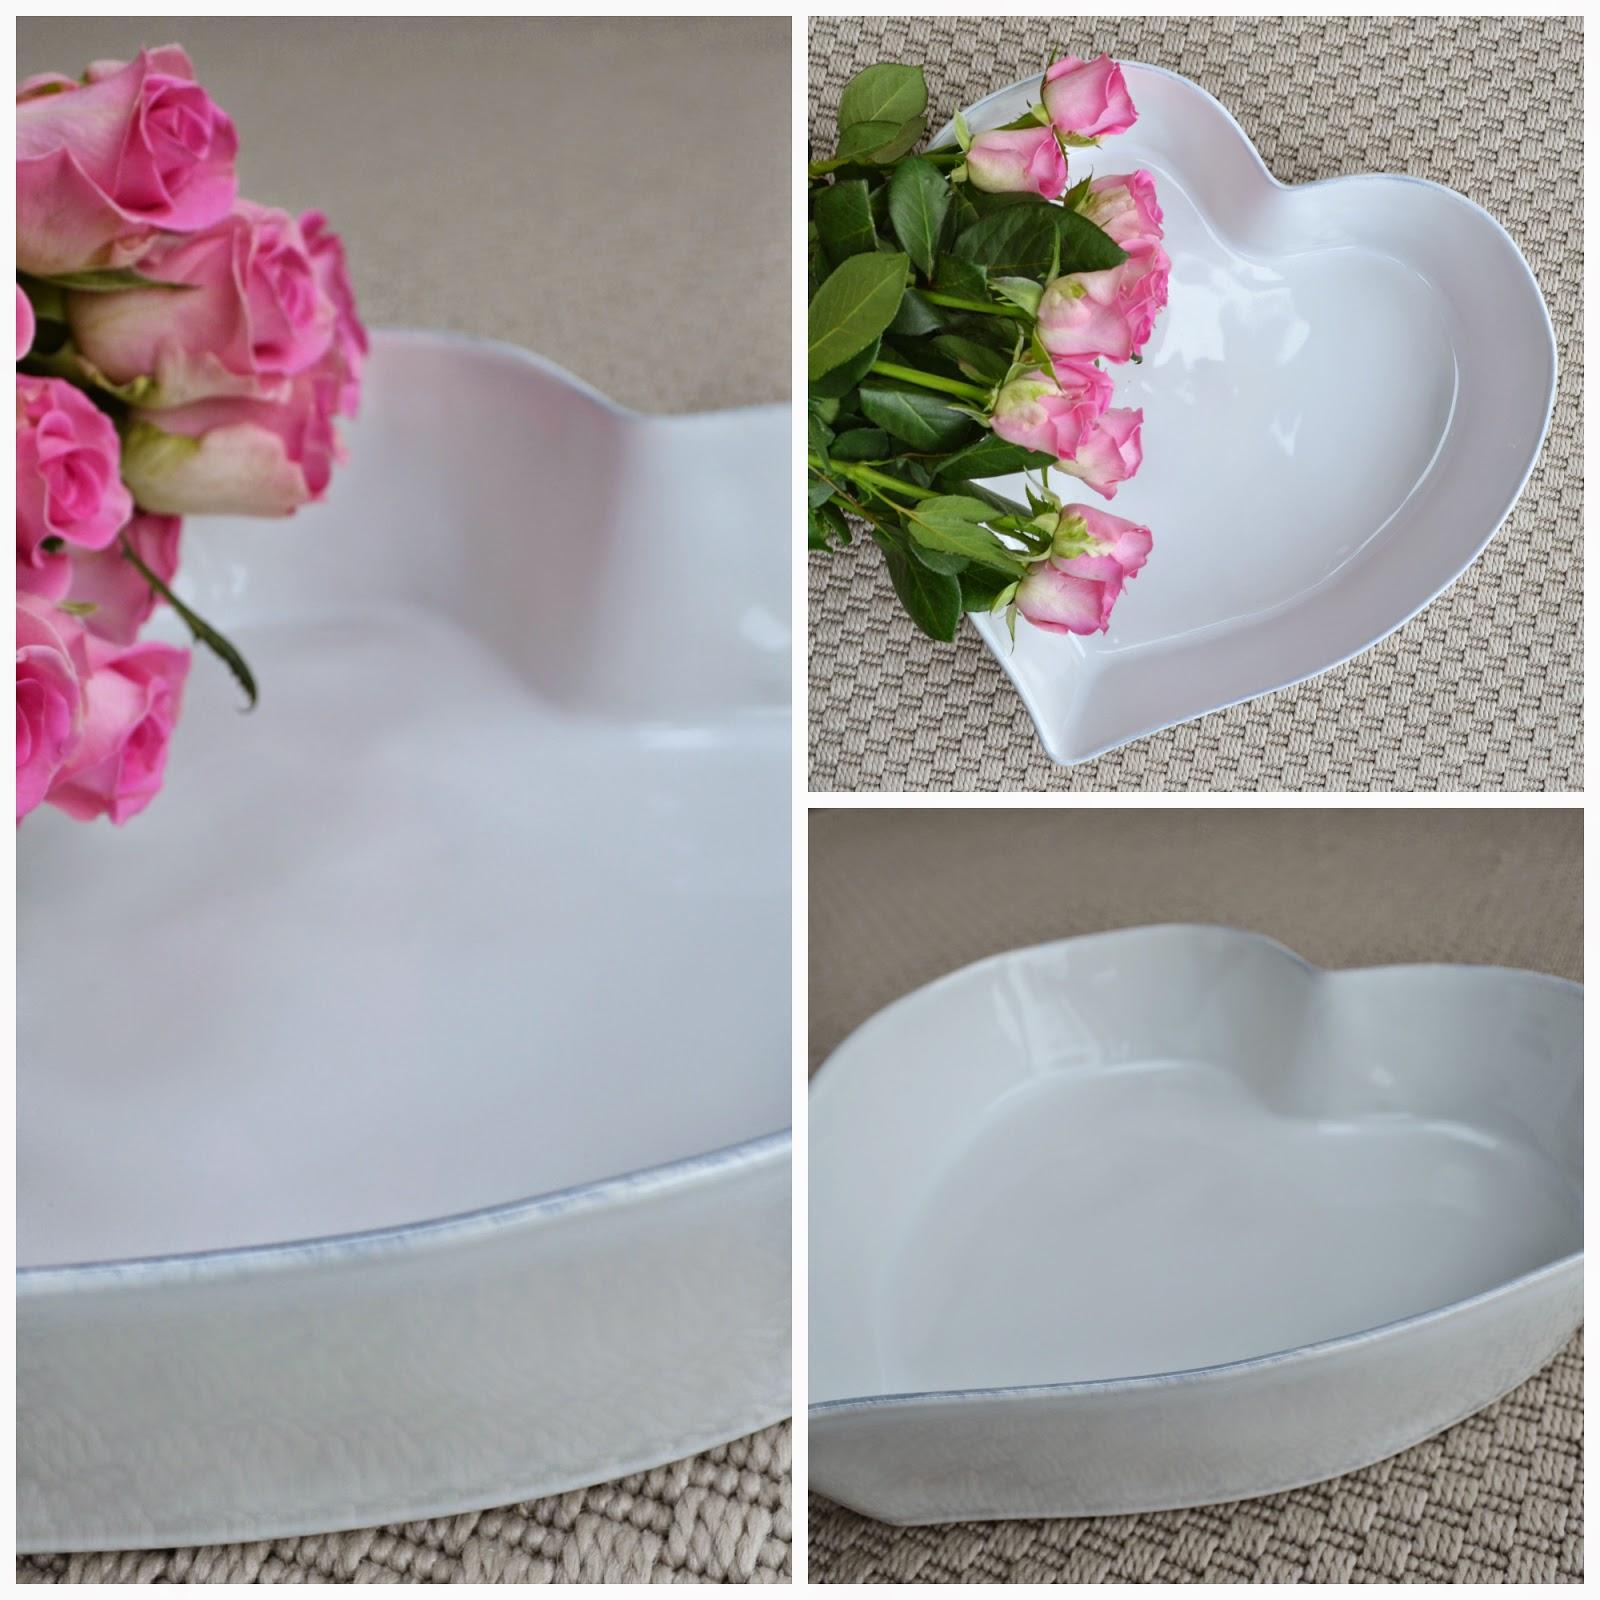 The White Company heart bowl